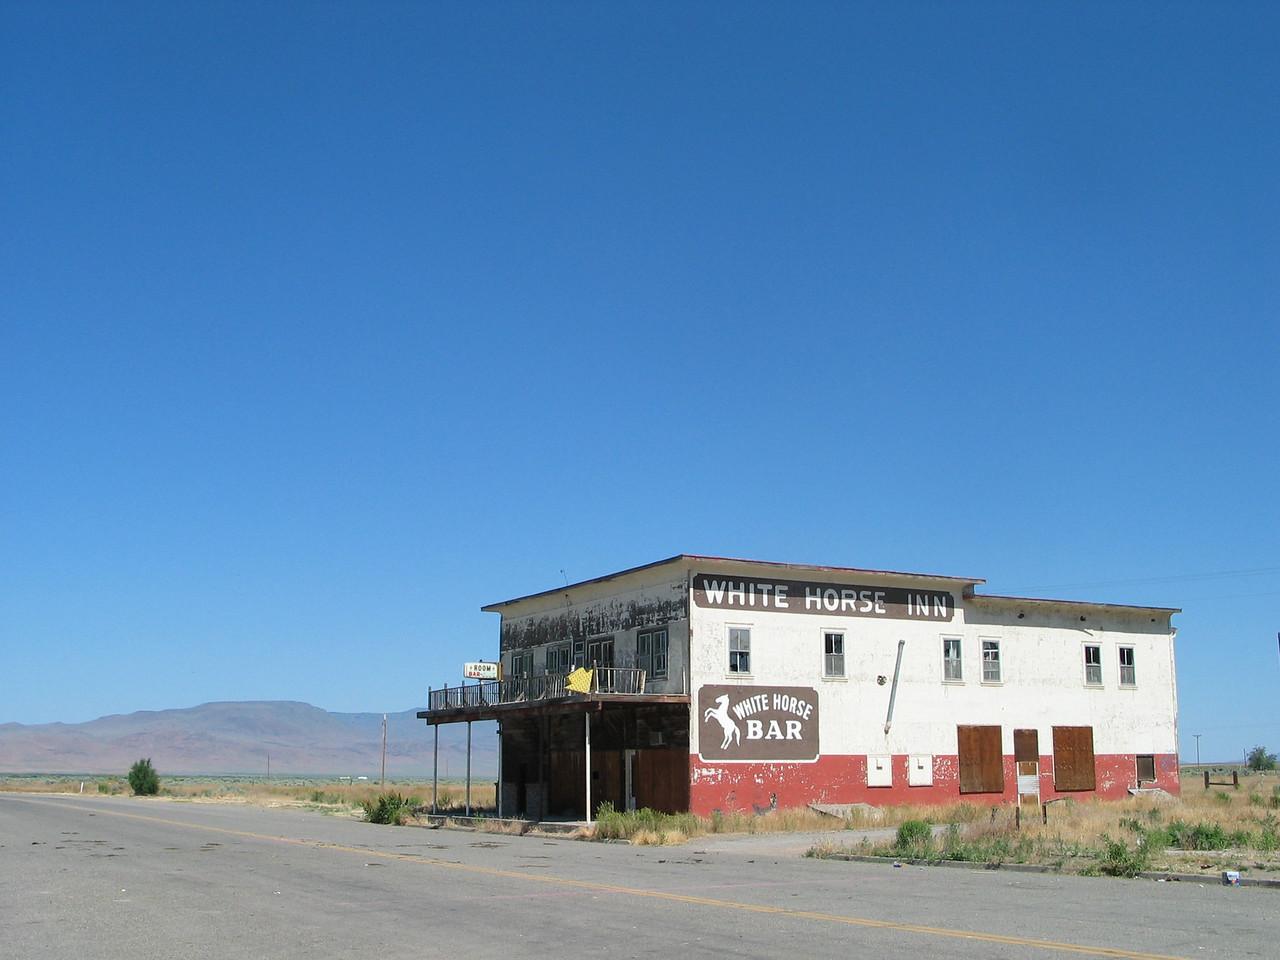 North of Black Rock in Nevada